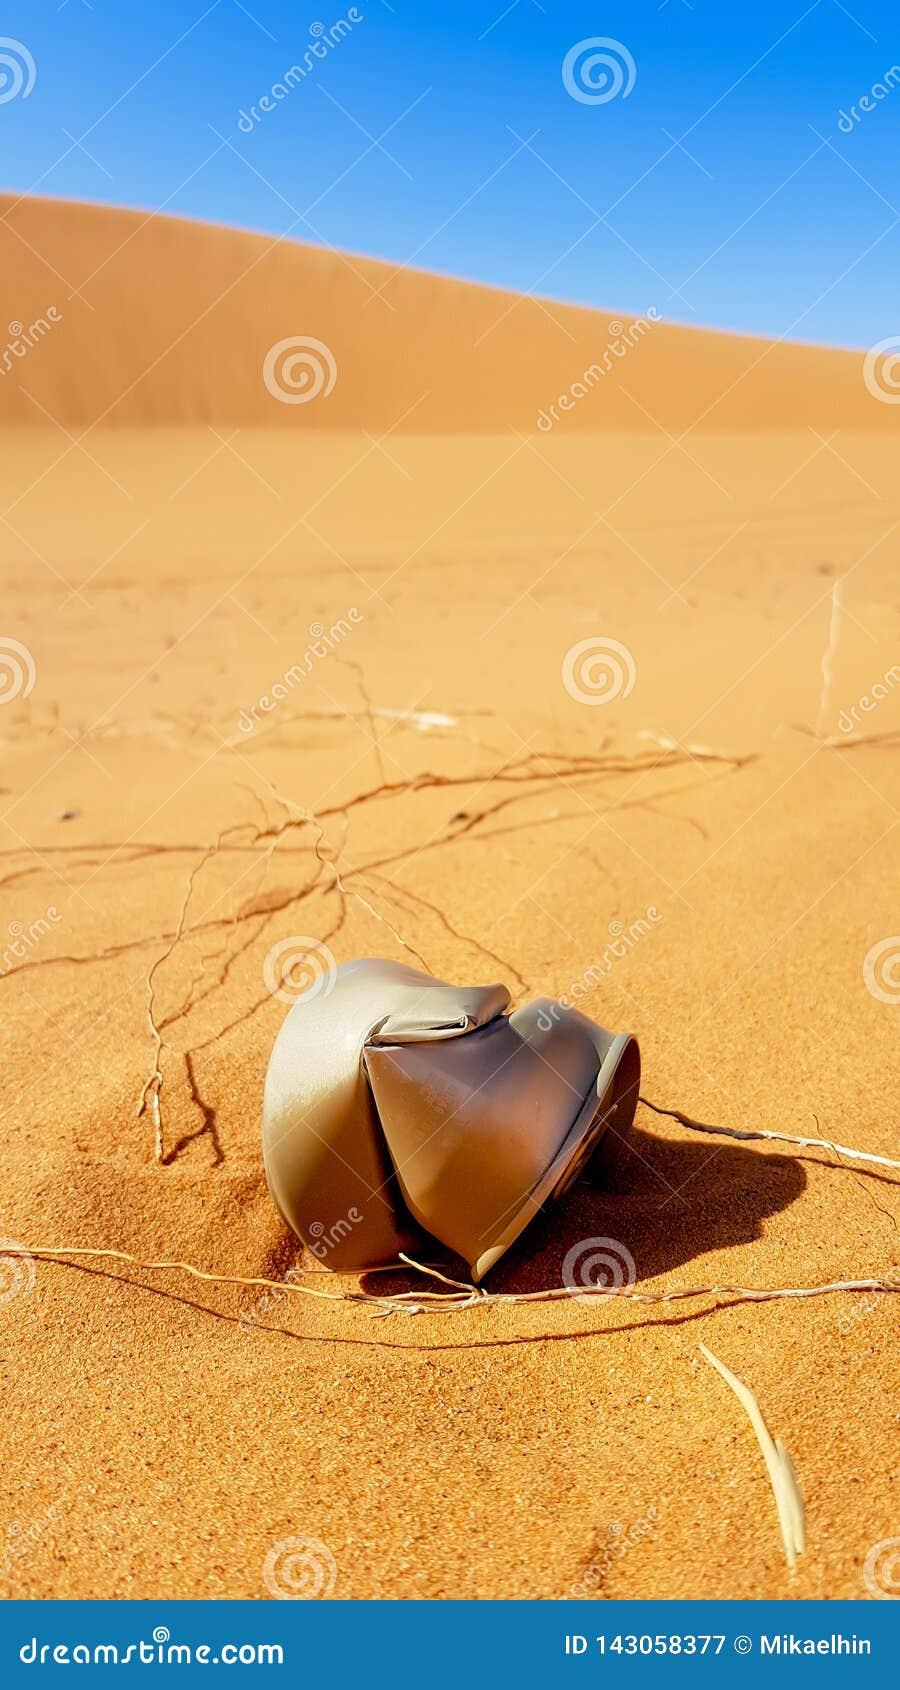 Maca no deserto, lata oxidada na areia no deserto